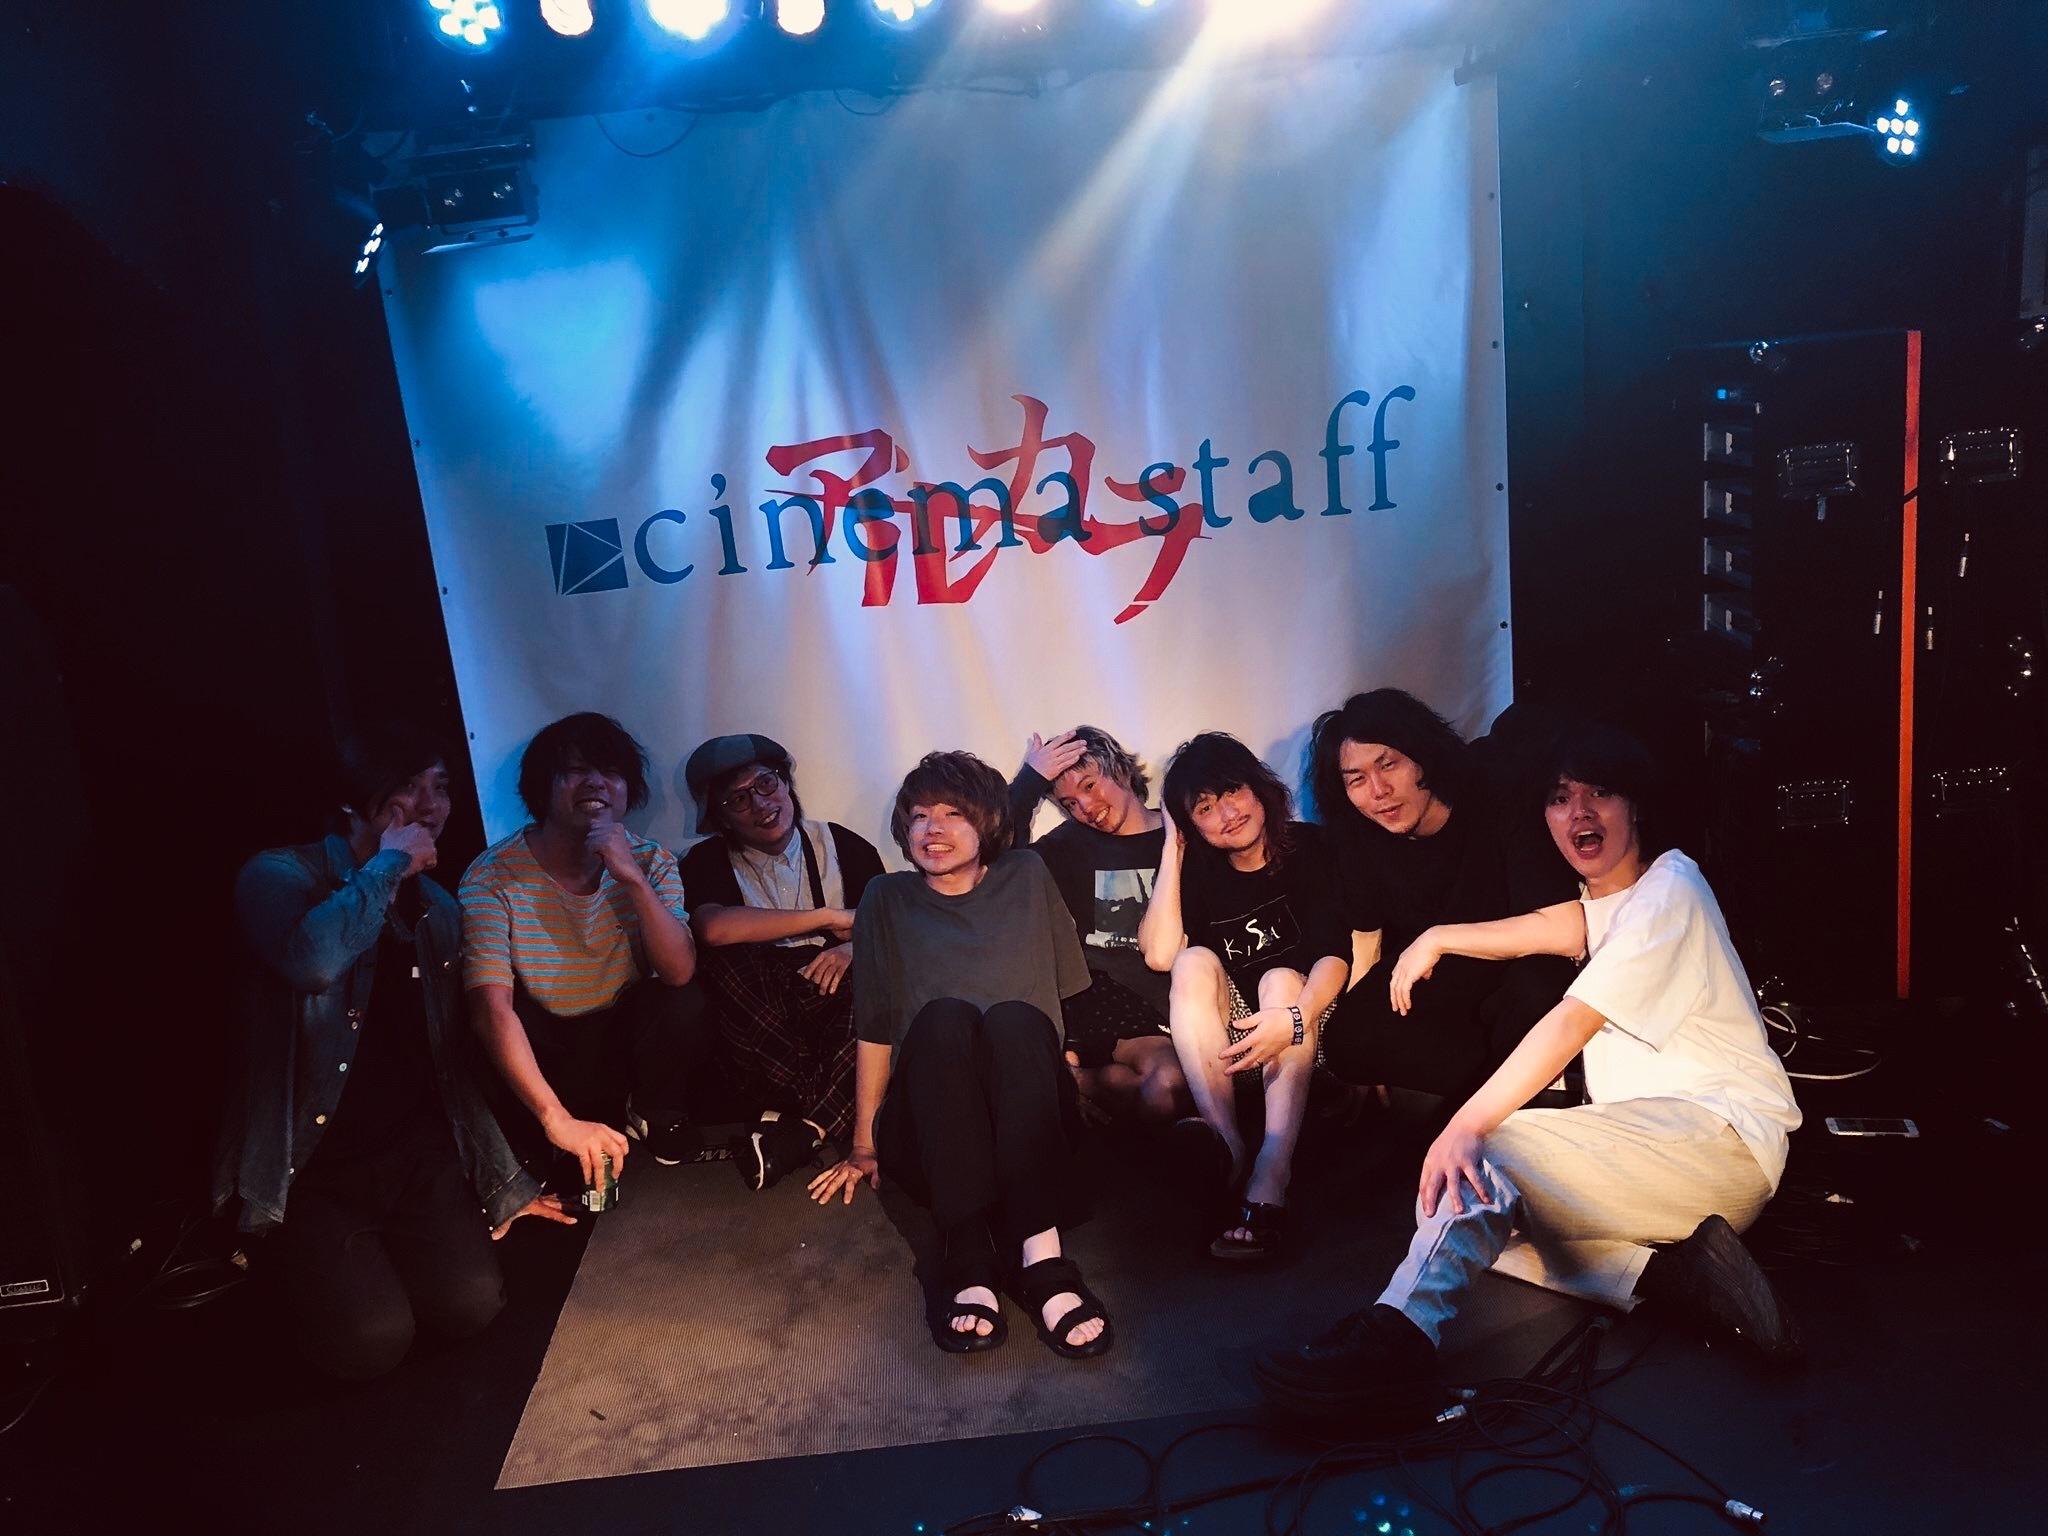 2019.5.13 岐阜柳ヶ瀬ants 「A.S.O.B.i tour」_c0222904_15523471.jpg